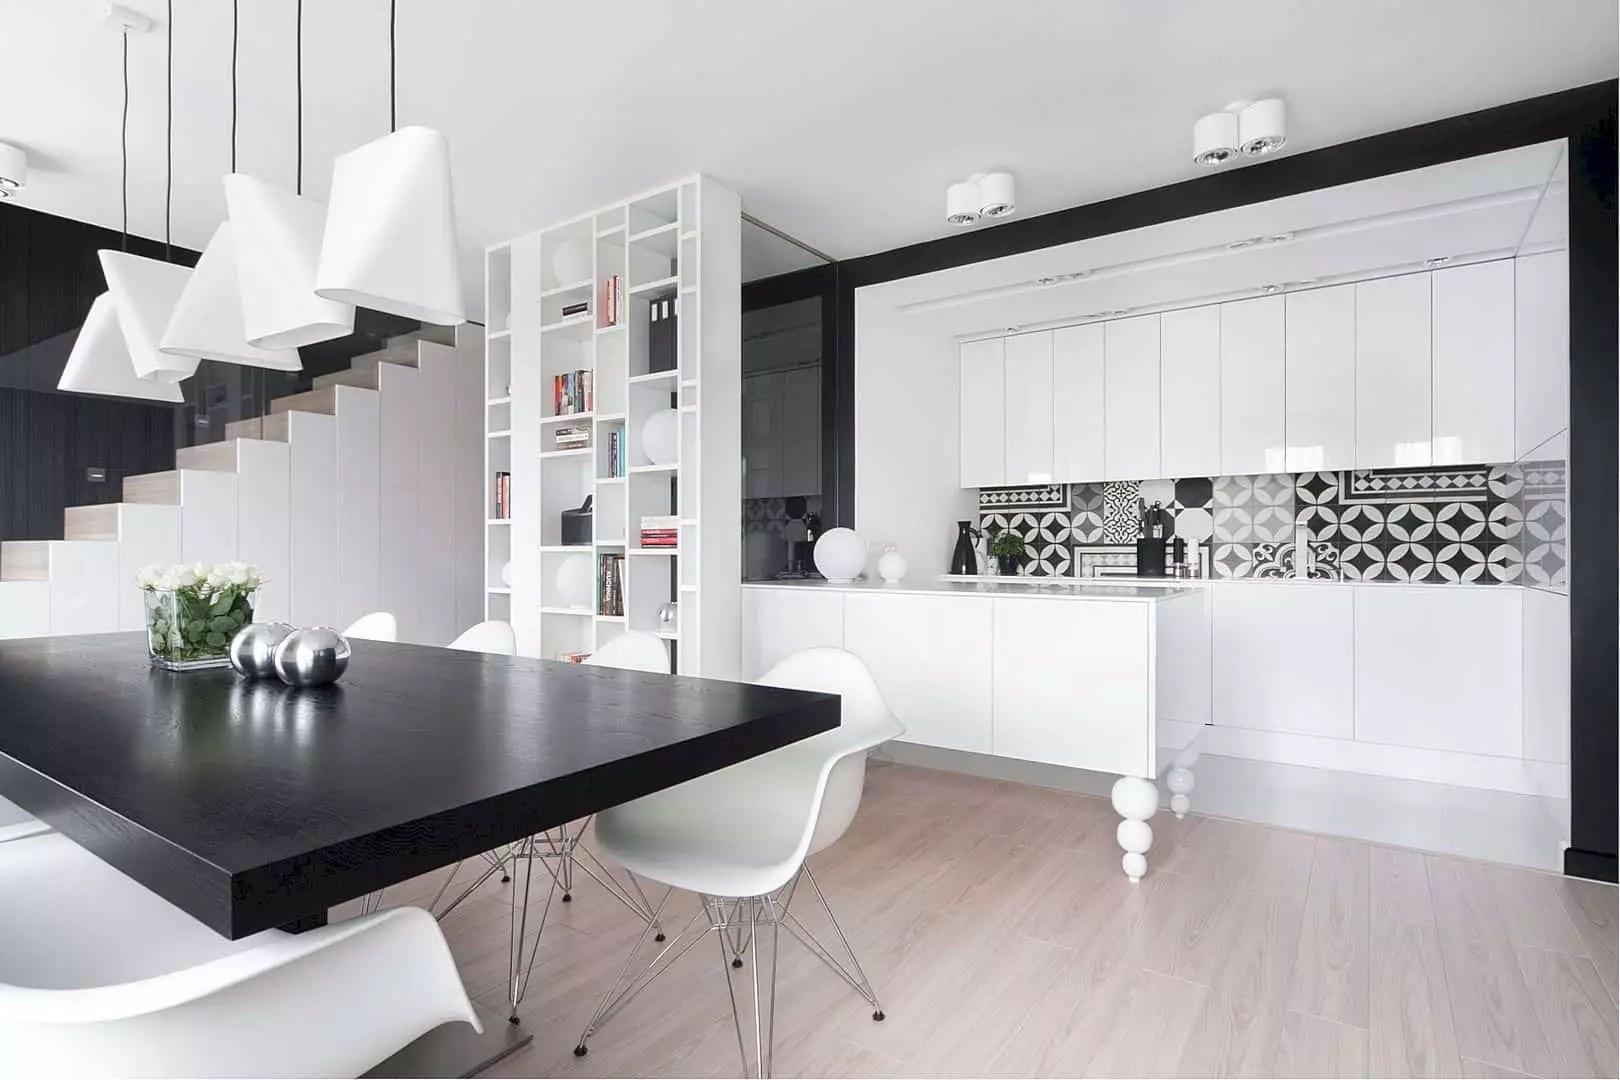 Mieszkanie Sosnowiec: Three-Level Apartment with Elegant Interior and Black-White Elements